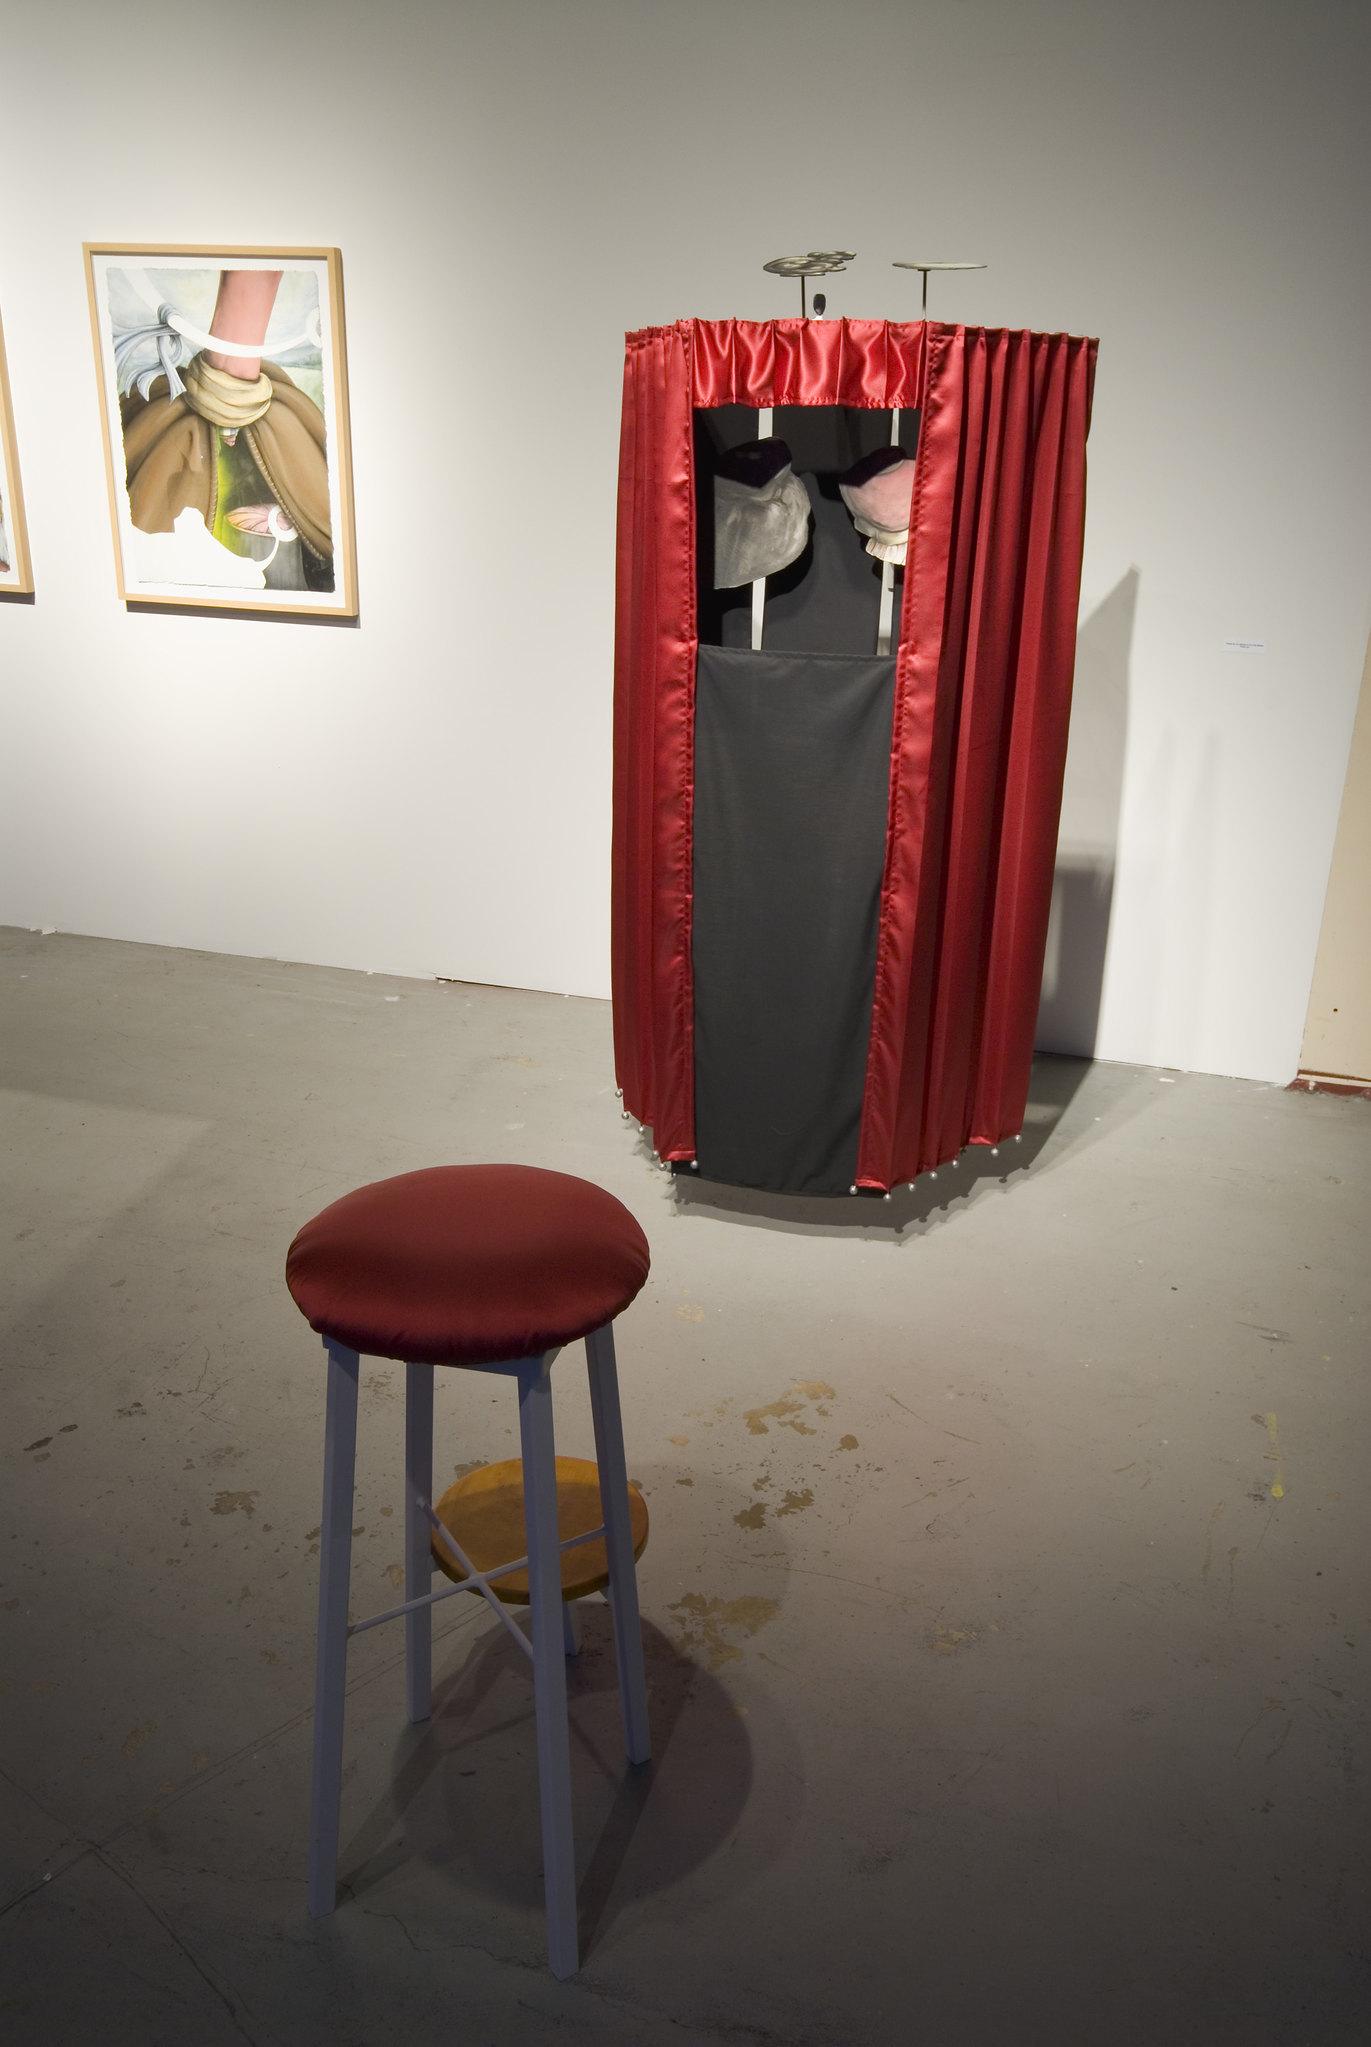 David Eckard Installation   Mountebank (A Moral Decline) exhibited at the Templeton Building